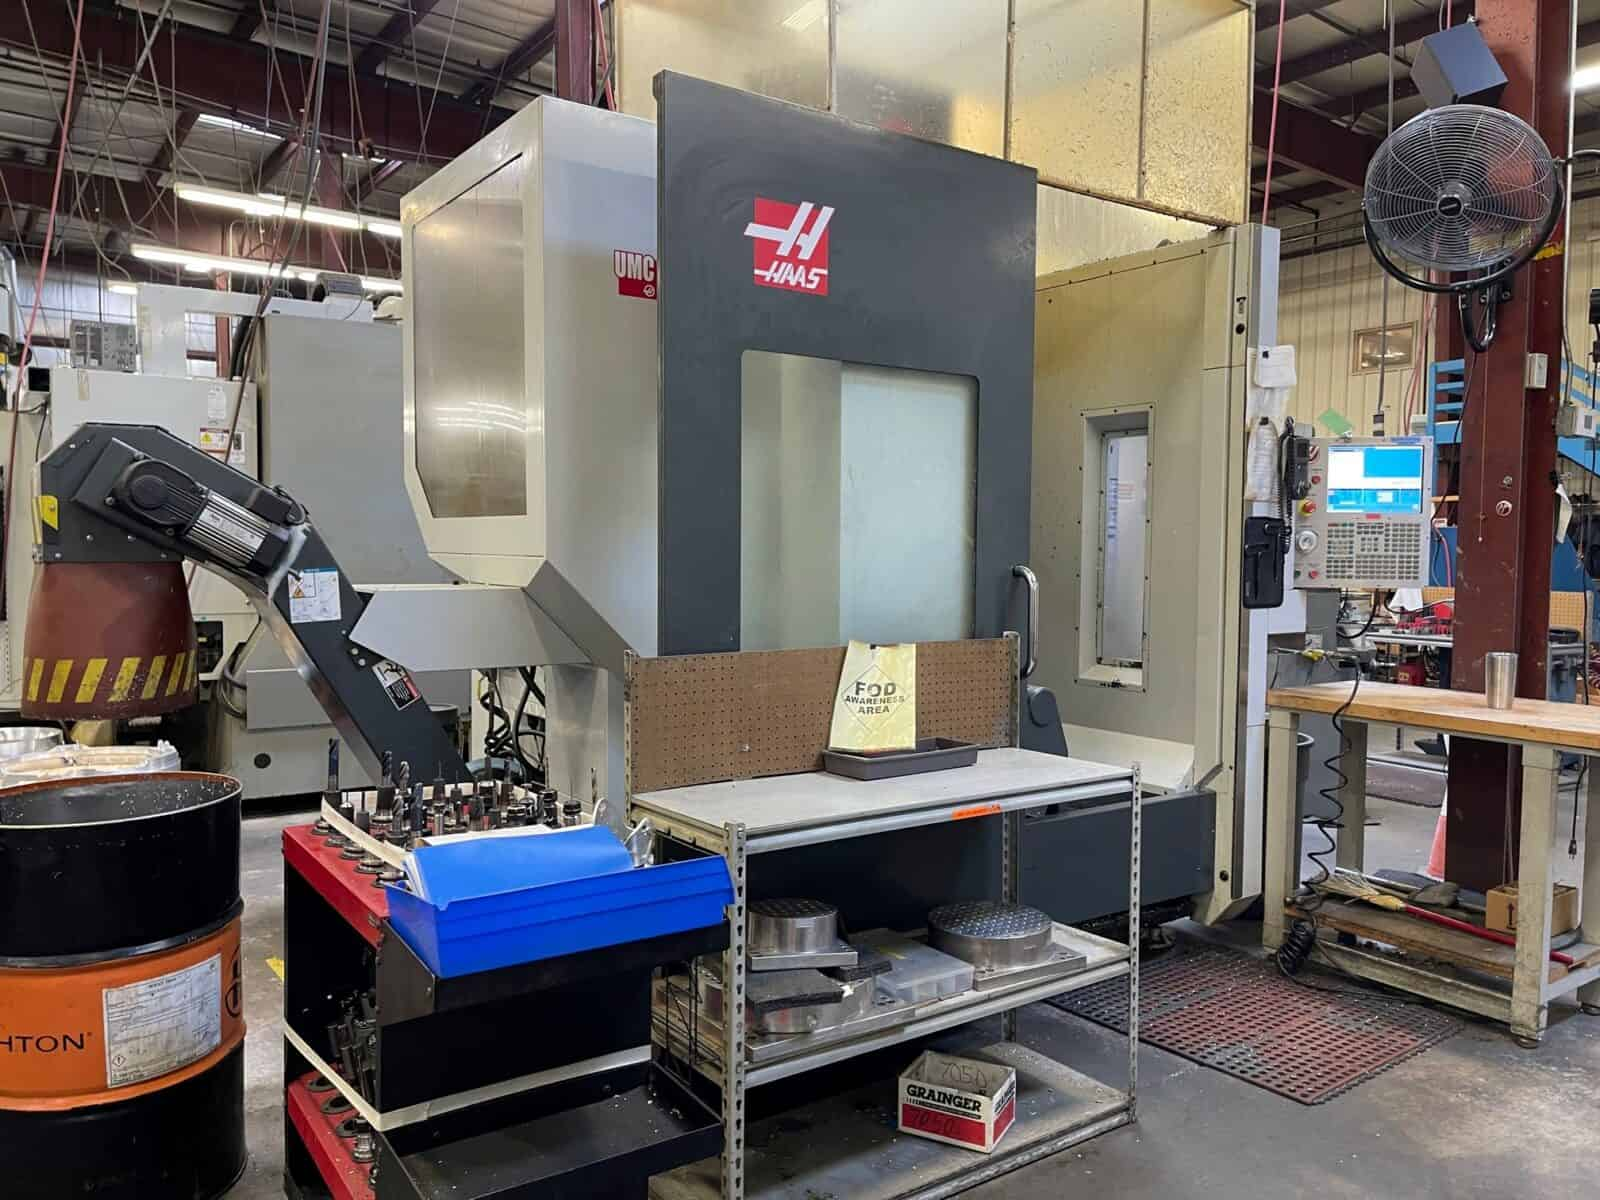 2015 Haas UMC-750